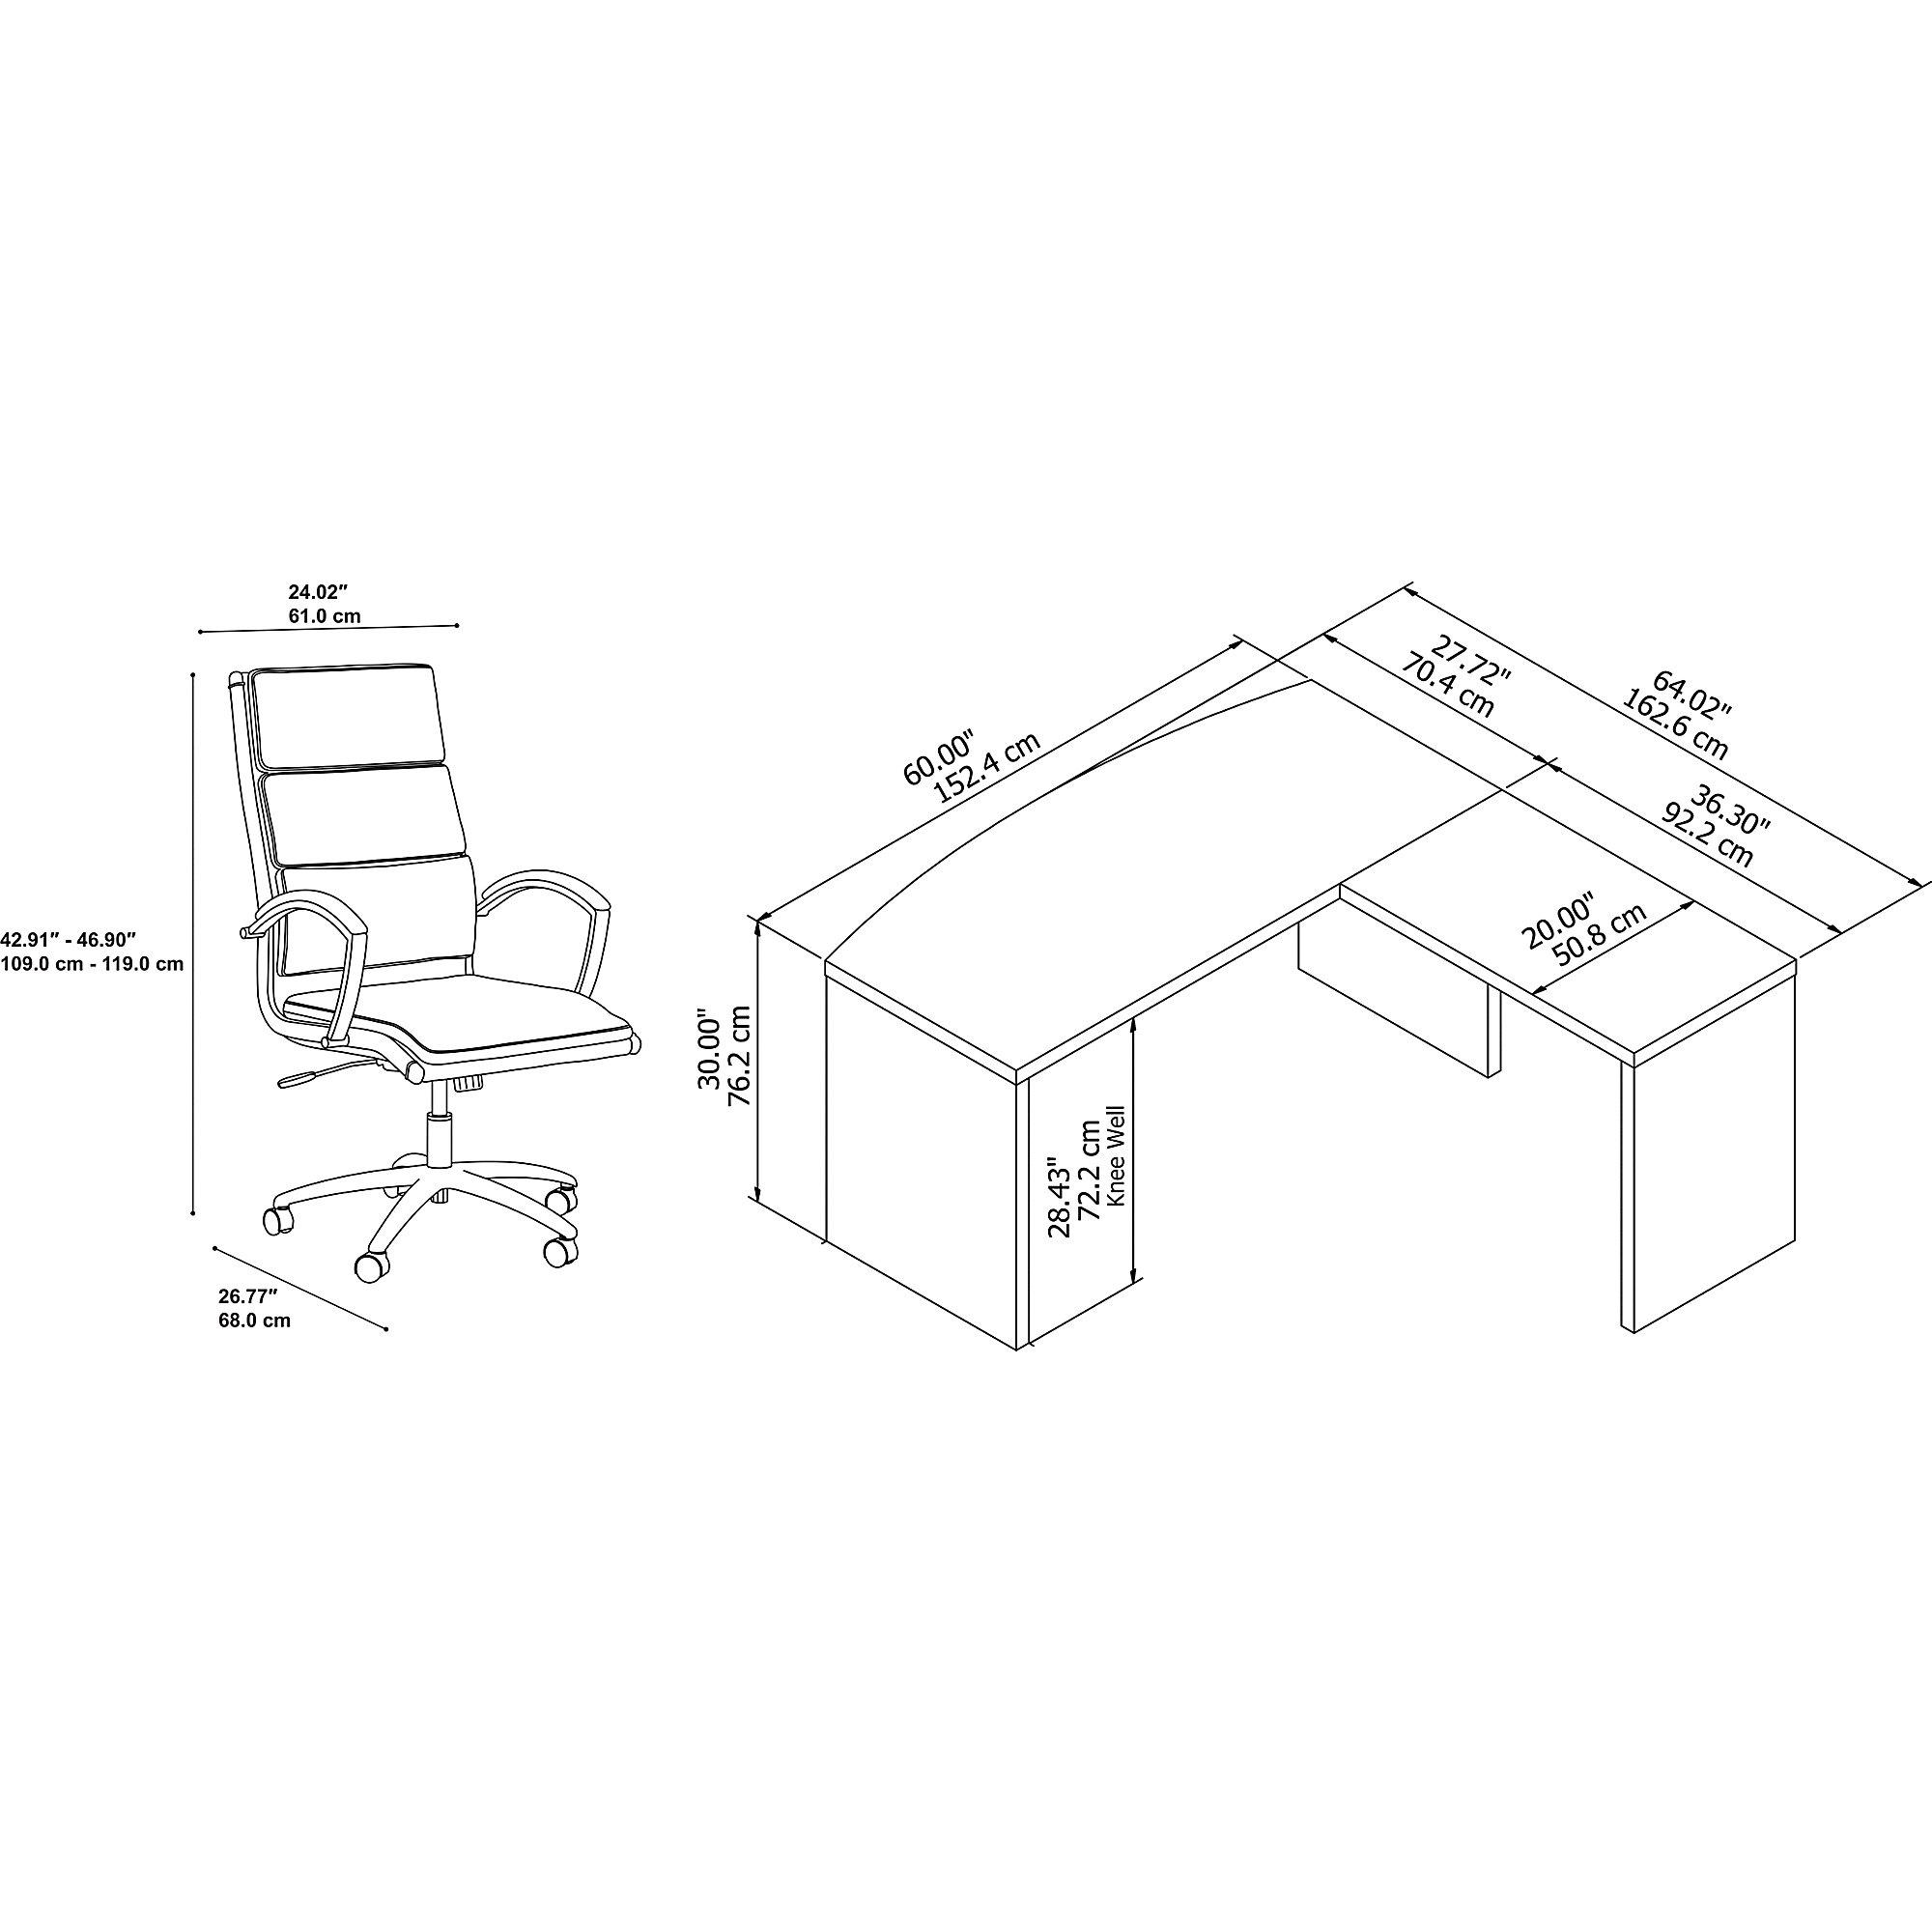 ech034 component dimensions